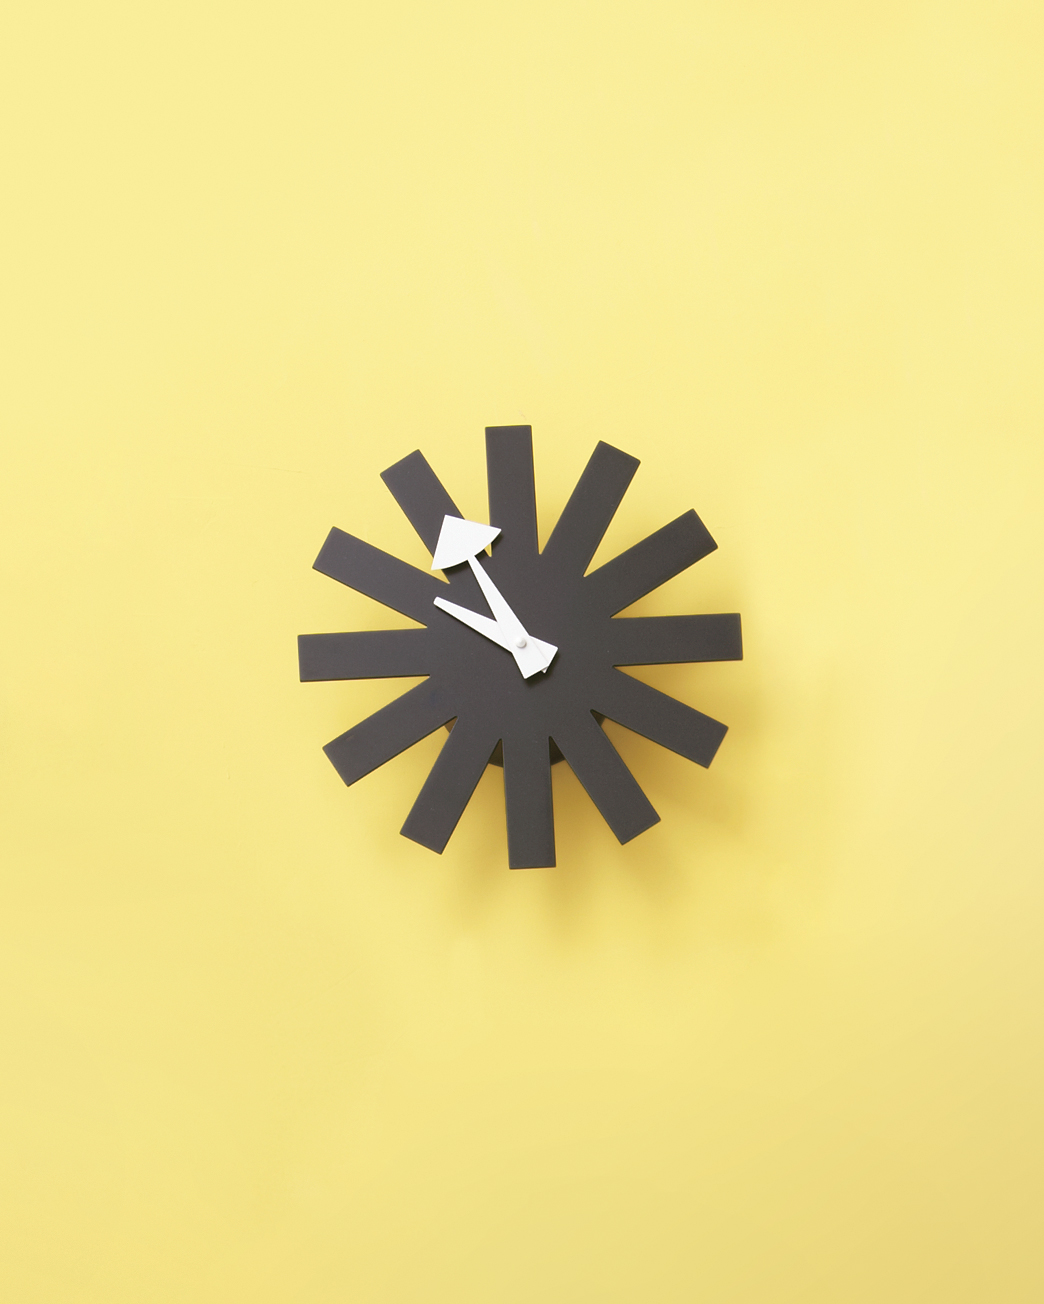 angel-sanchez-clock-mwd108878.jpg